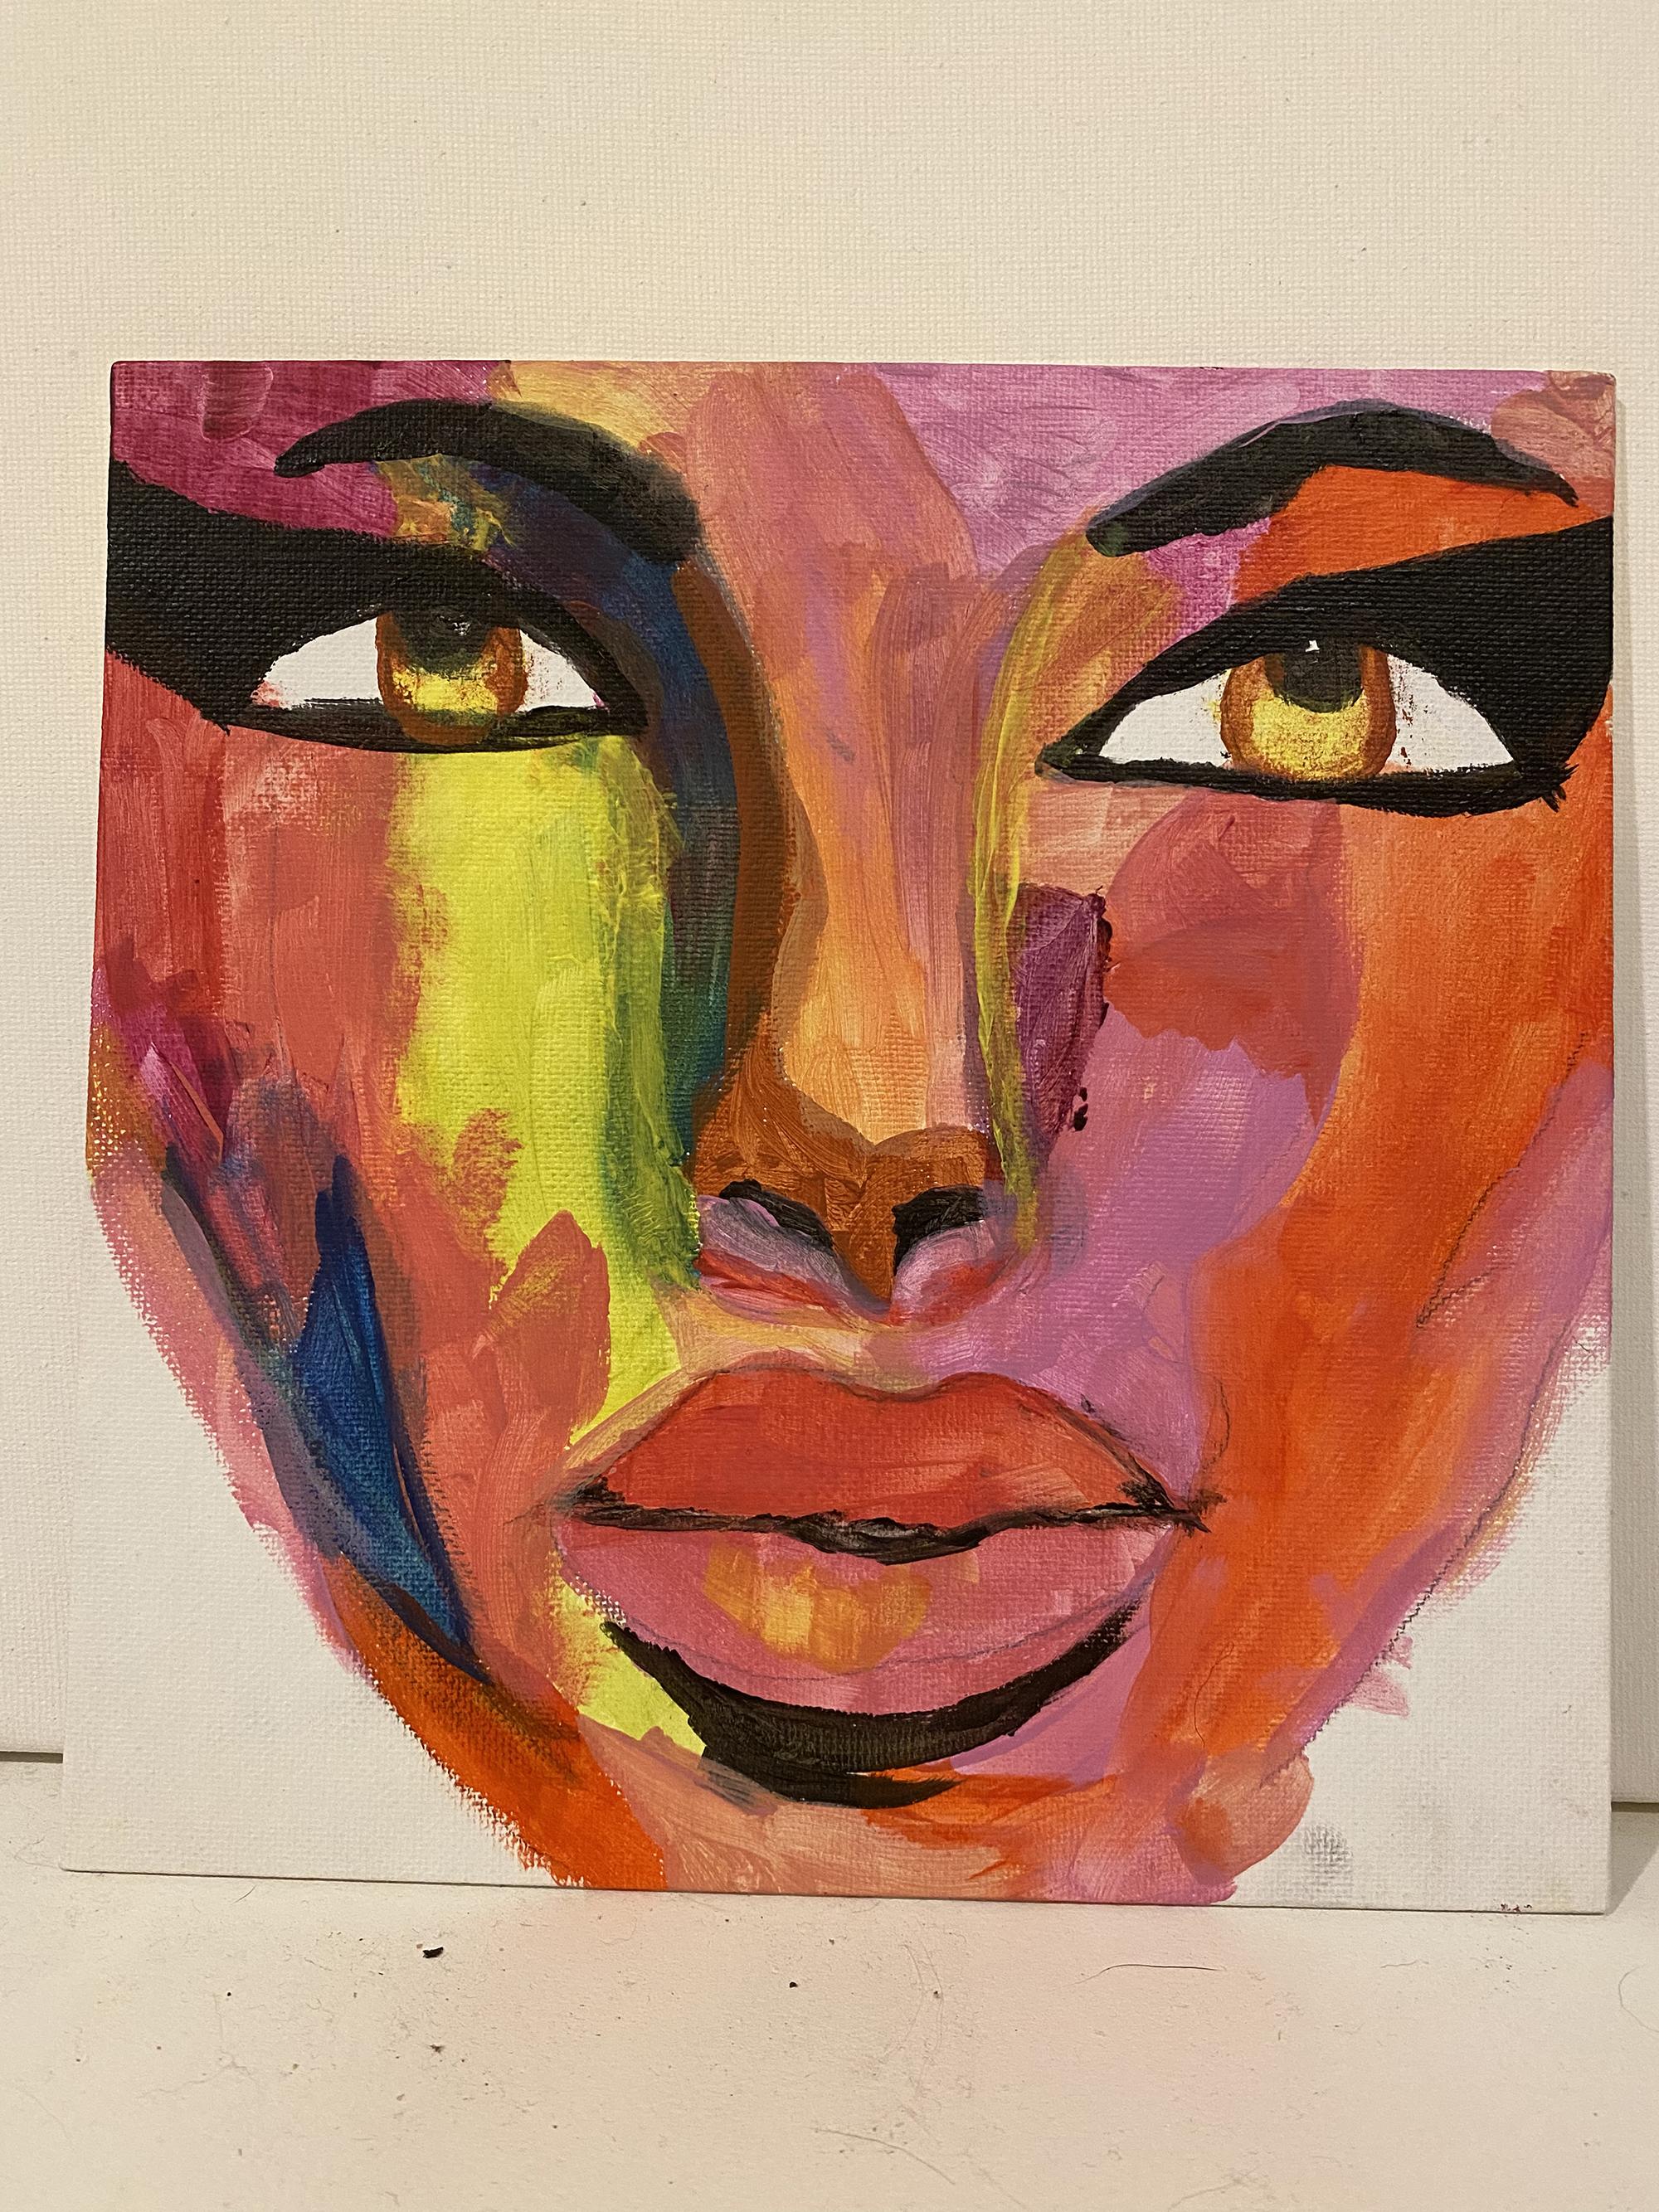 2nd. Lindsay Lotter, Rainbow of Emotions